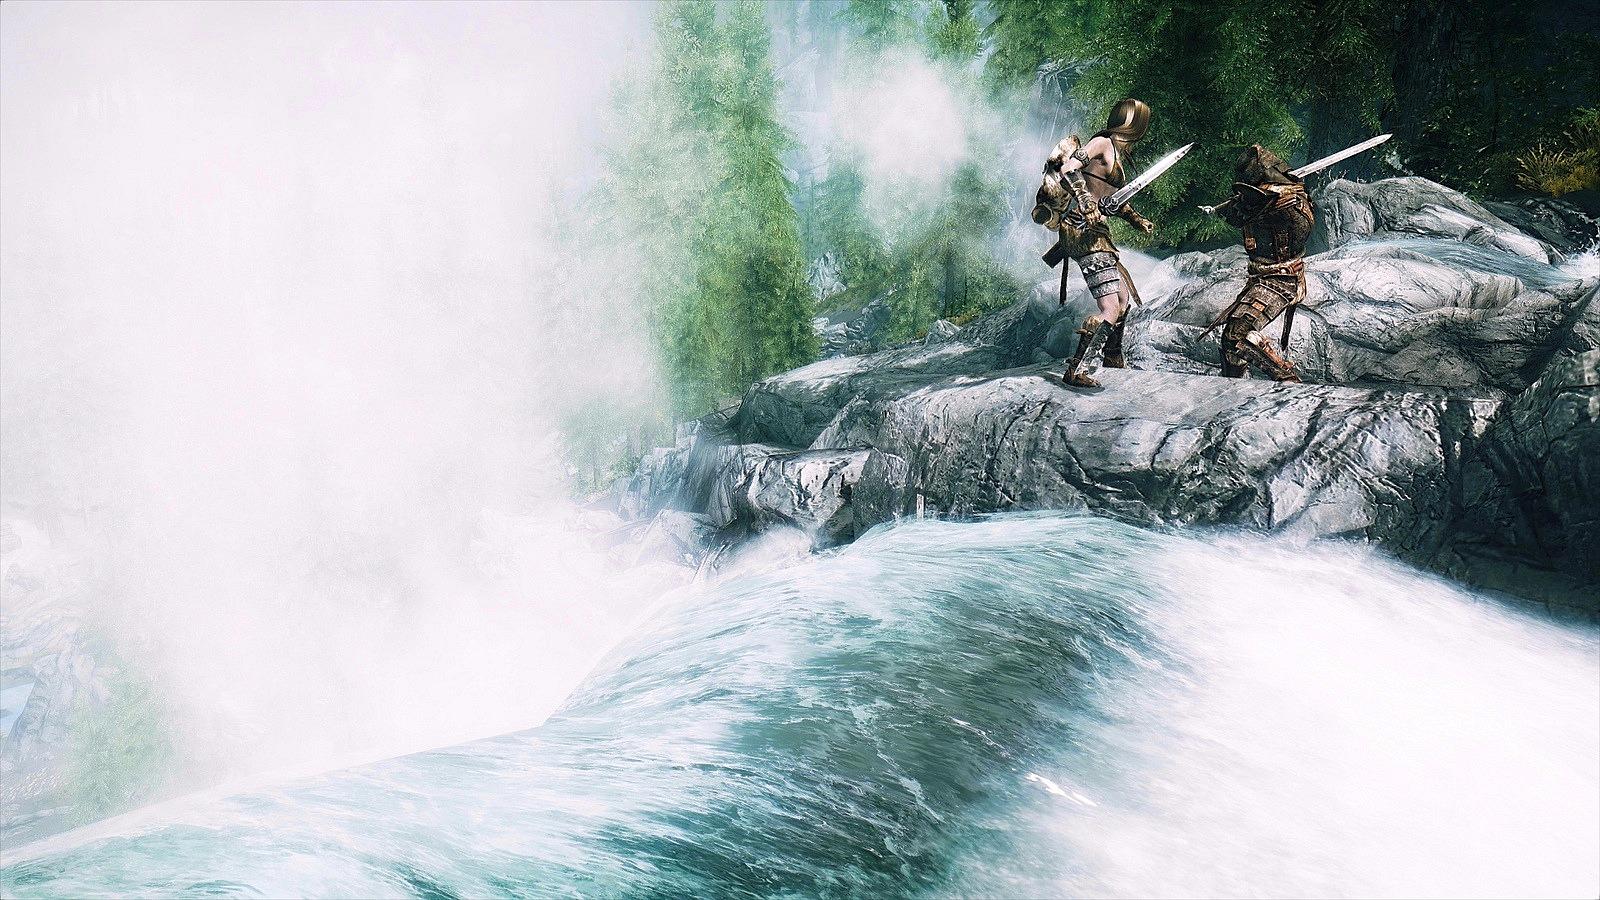 4 (10).jpg - Elder Scrolls 5: Skyrim, the